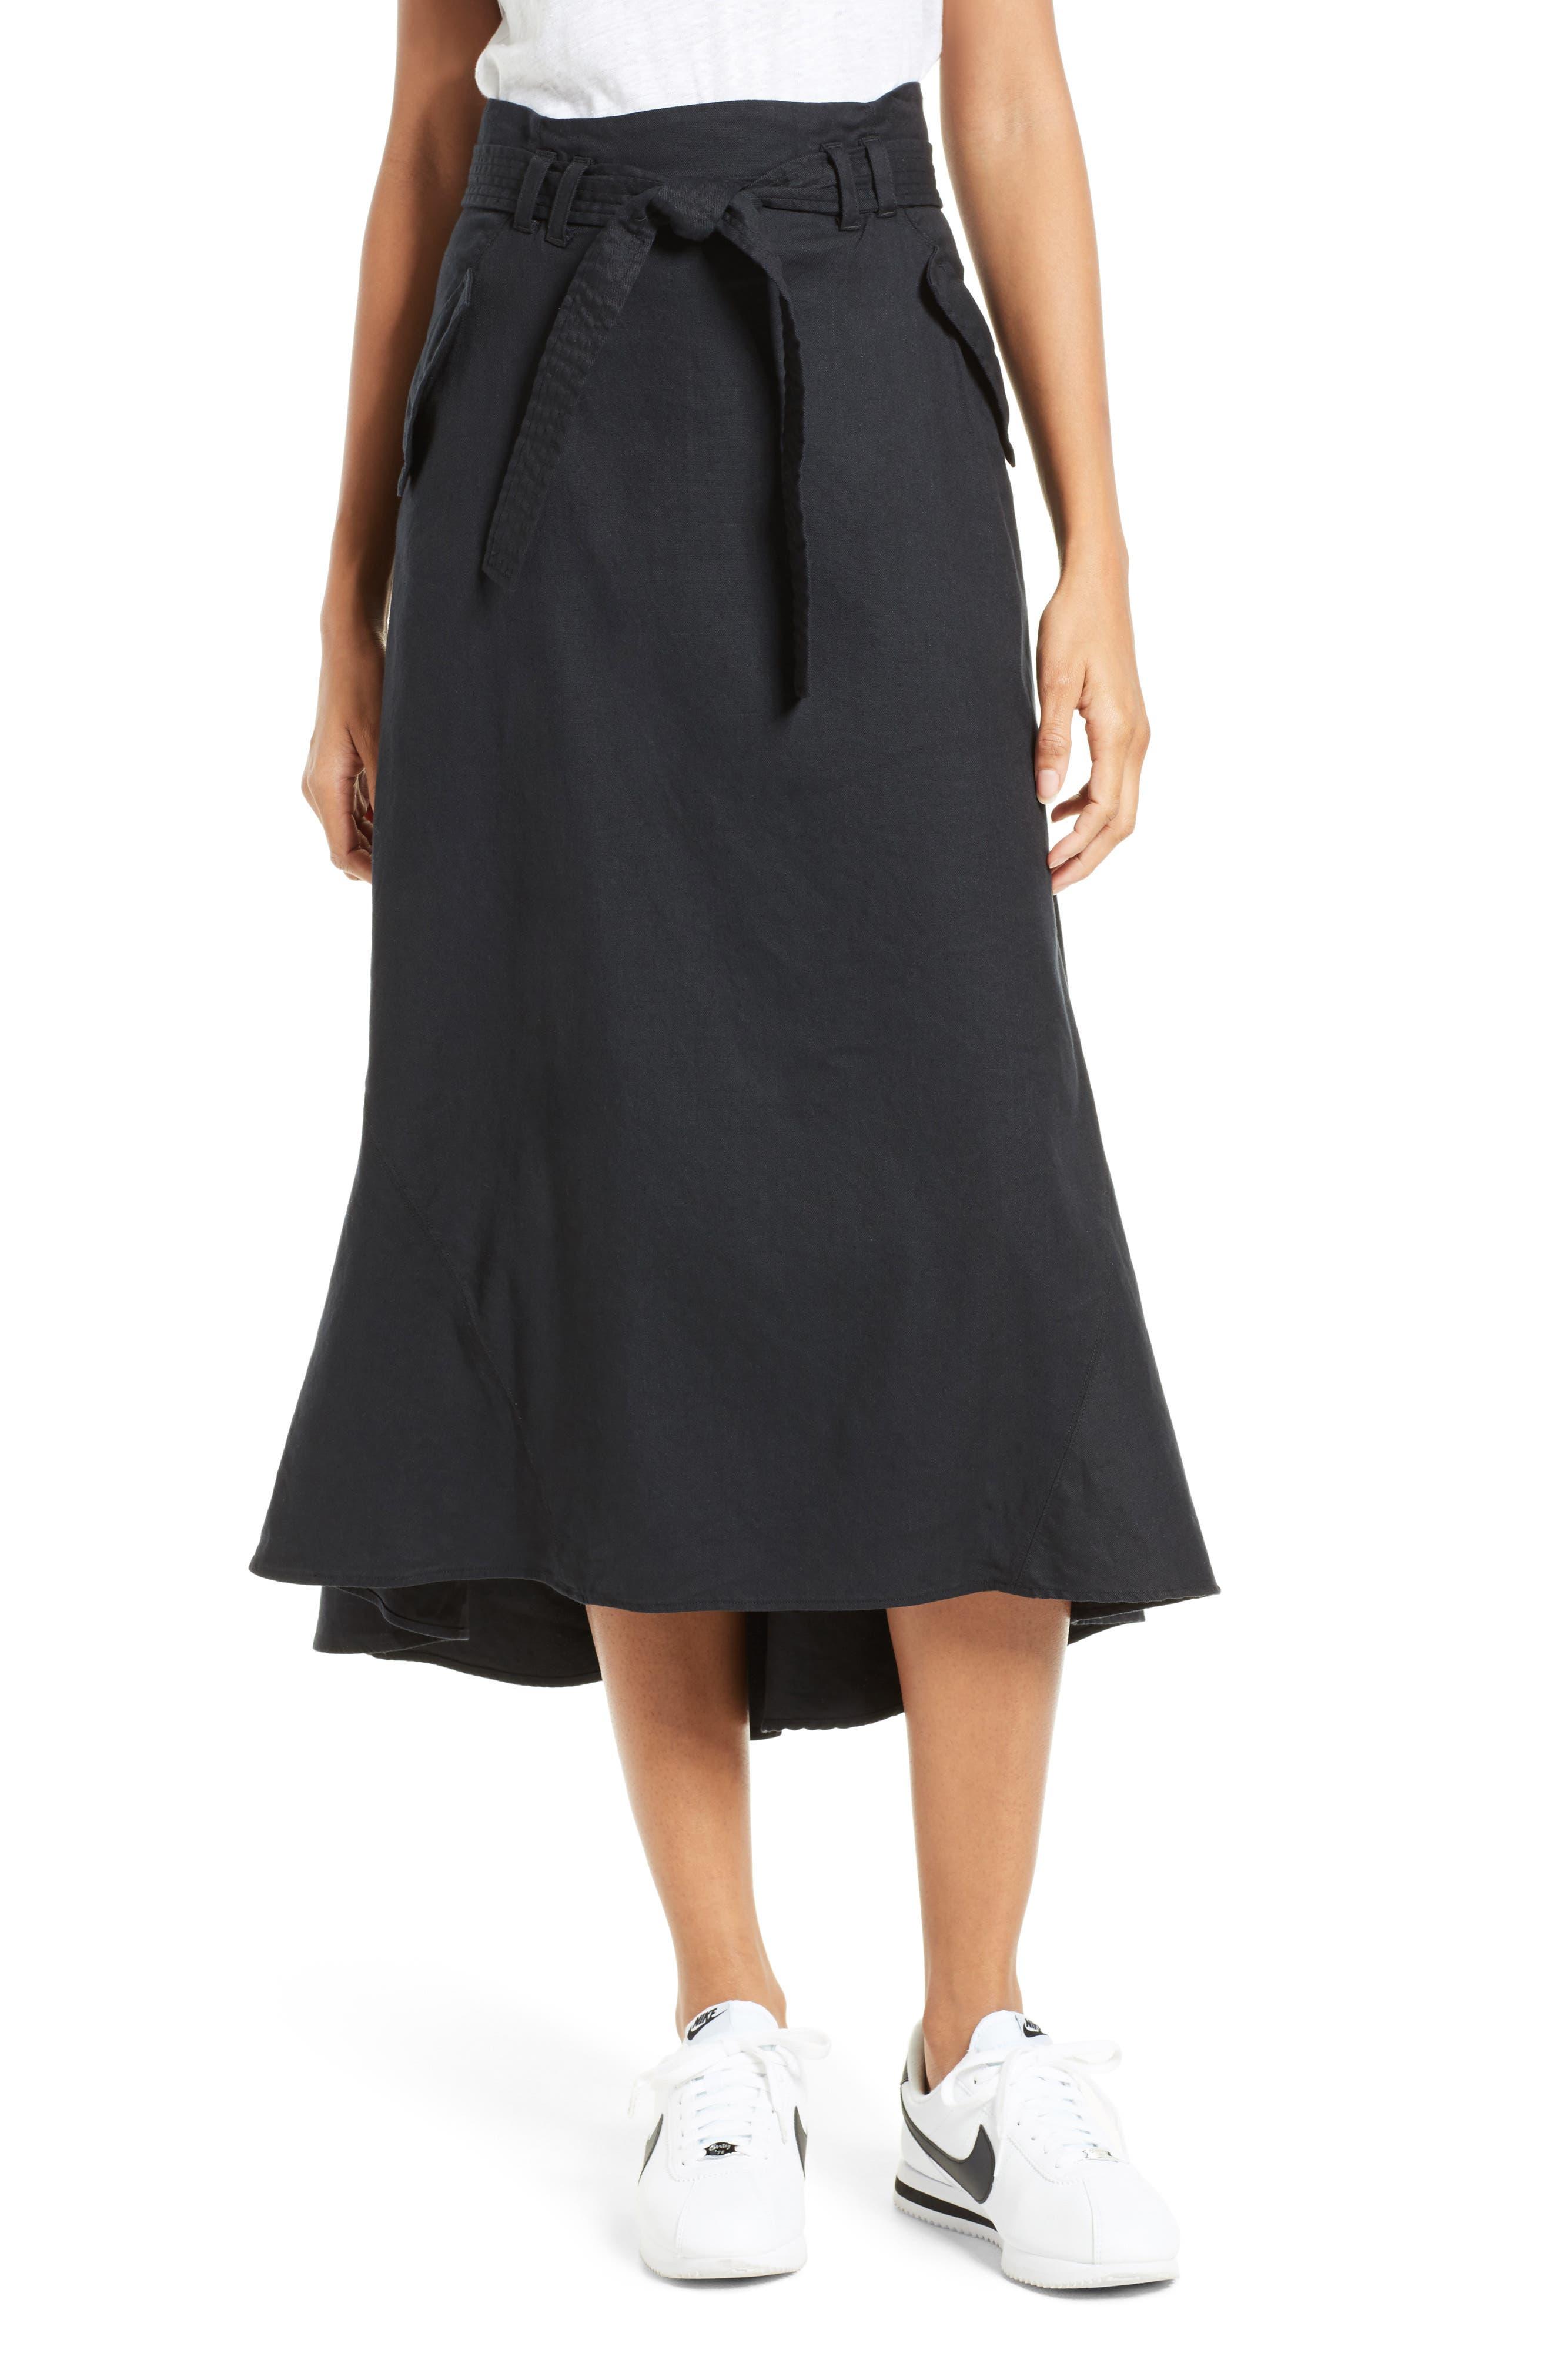 Alternate Image 1 Selected - A.L.C. Midi Skirt